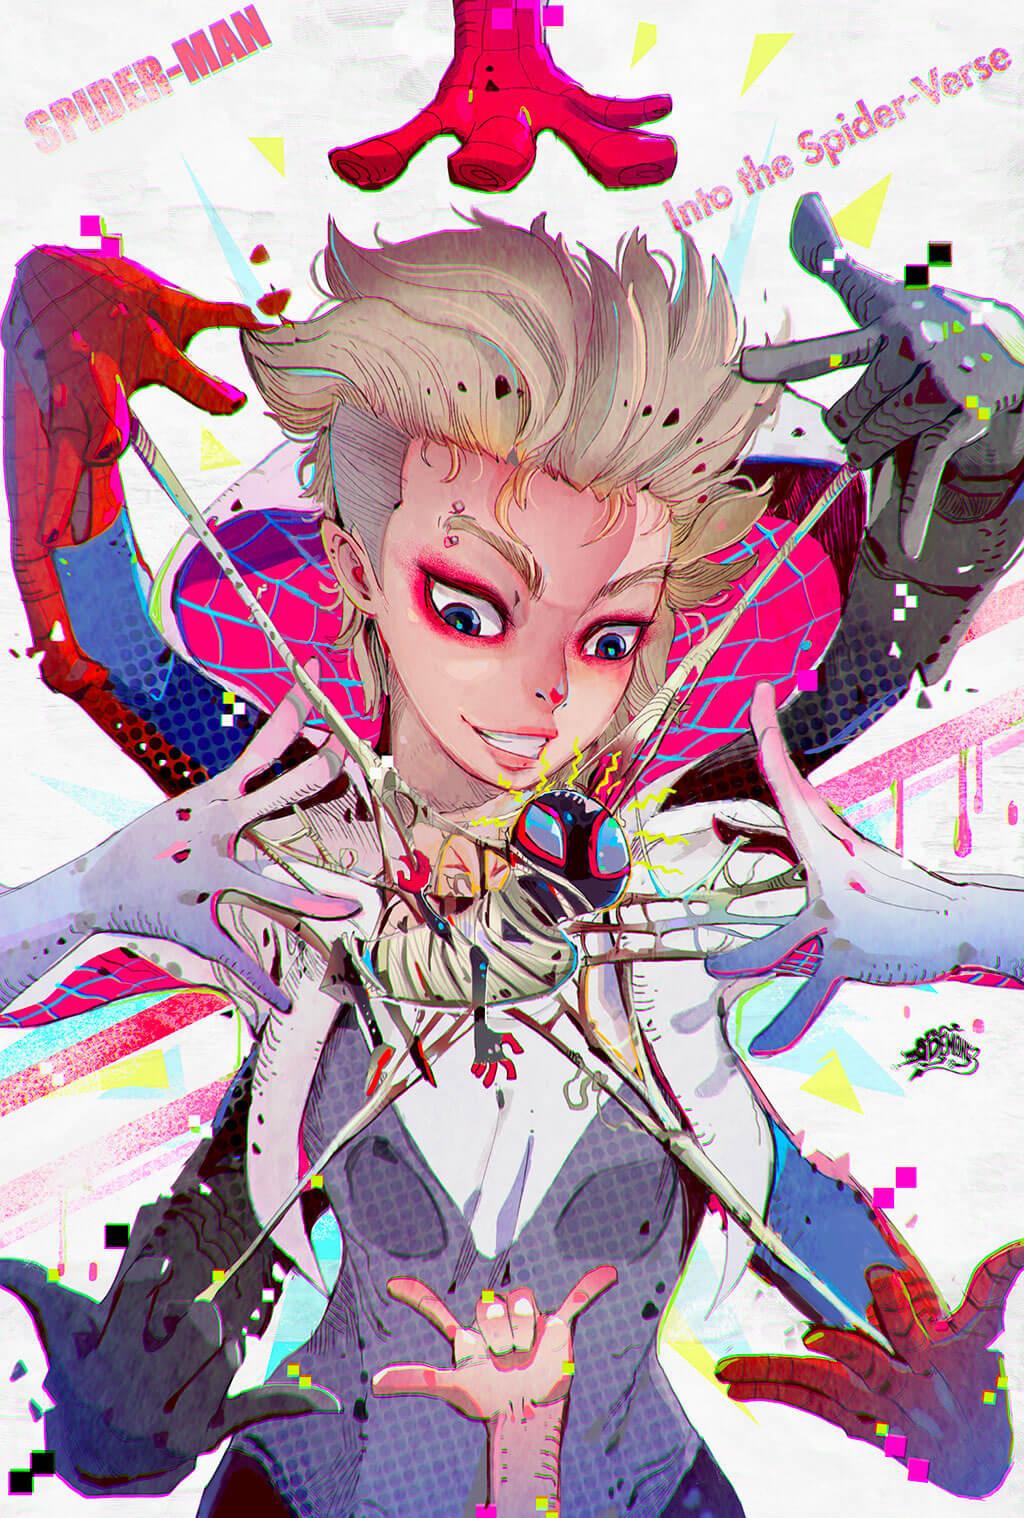 Spider-Man Fan Art by Narupiti Harunsong